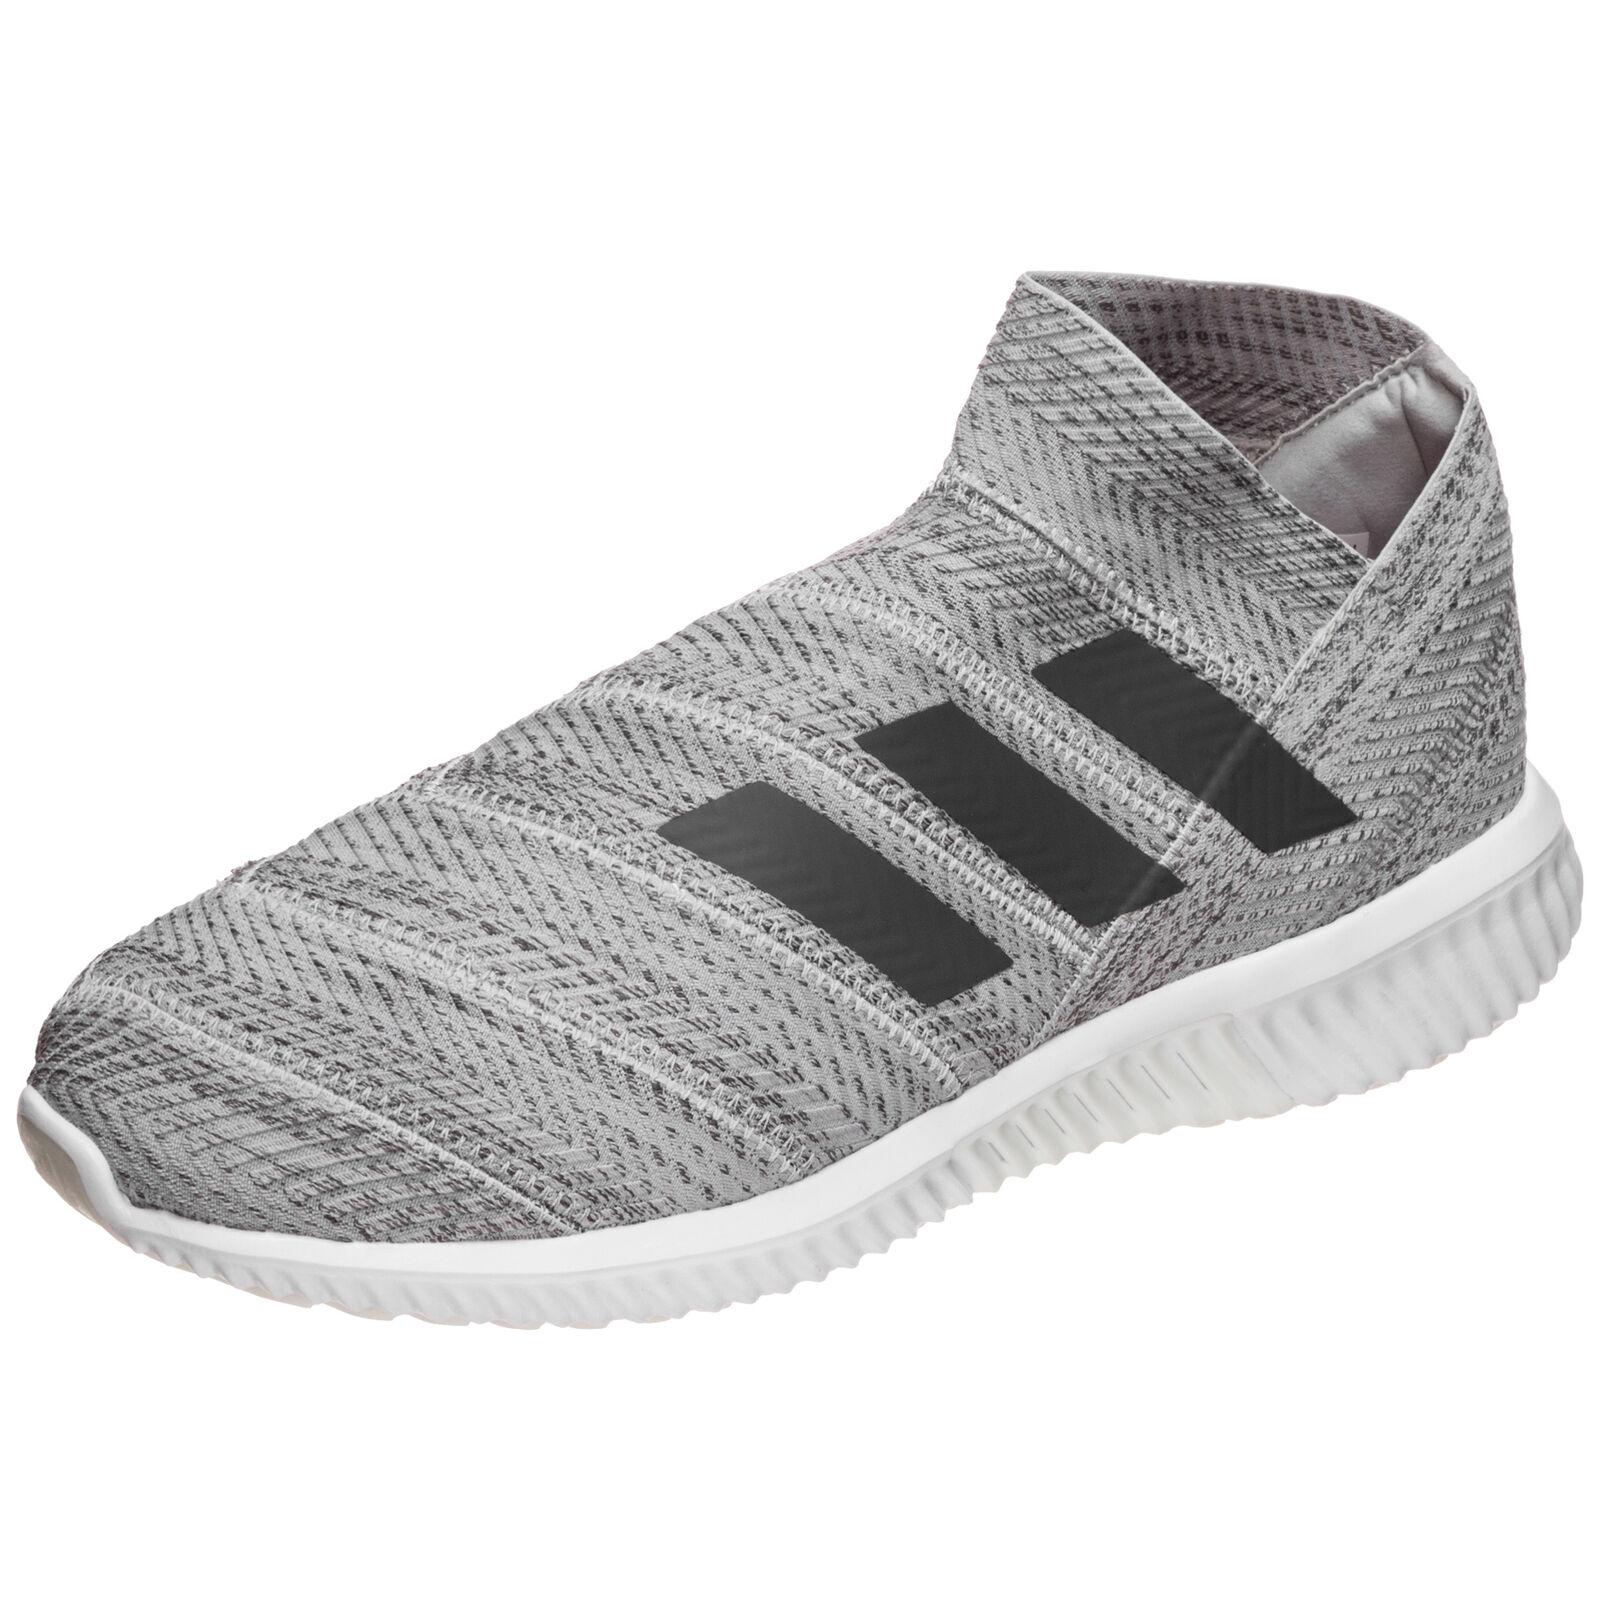 Adidas Performance Nemeziz 18.1 Trainers Street Turnschuhe Herren NEU  | Gewinnen Sie hoch geschätzt